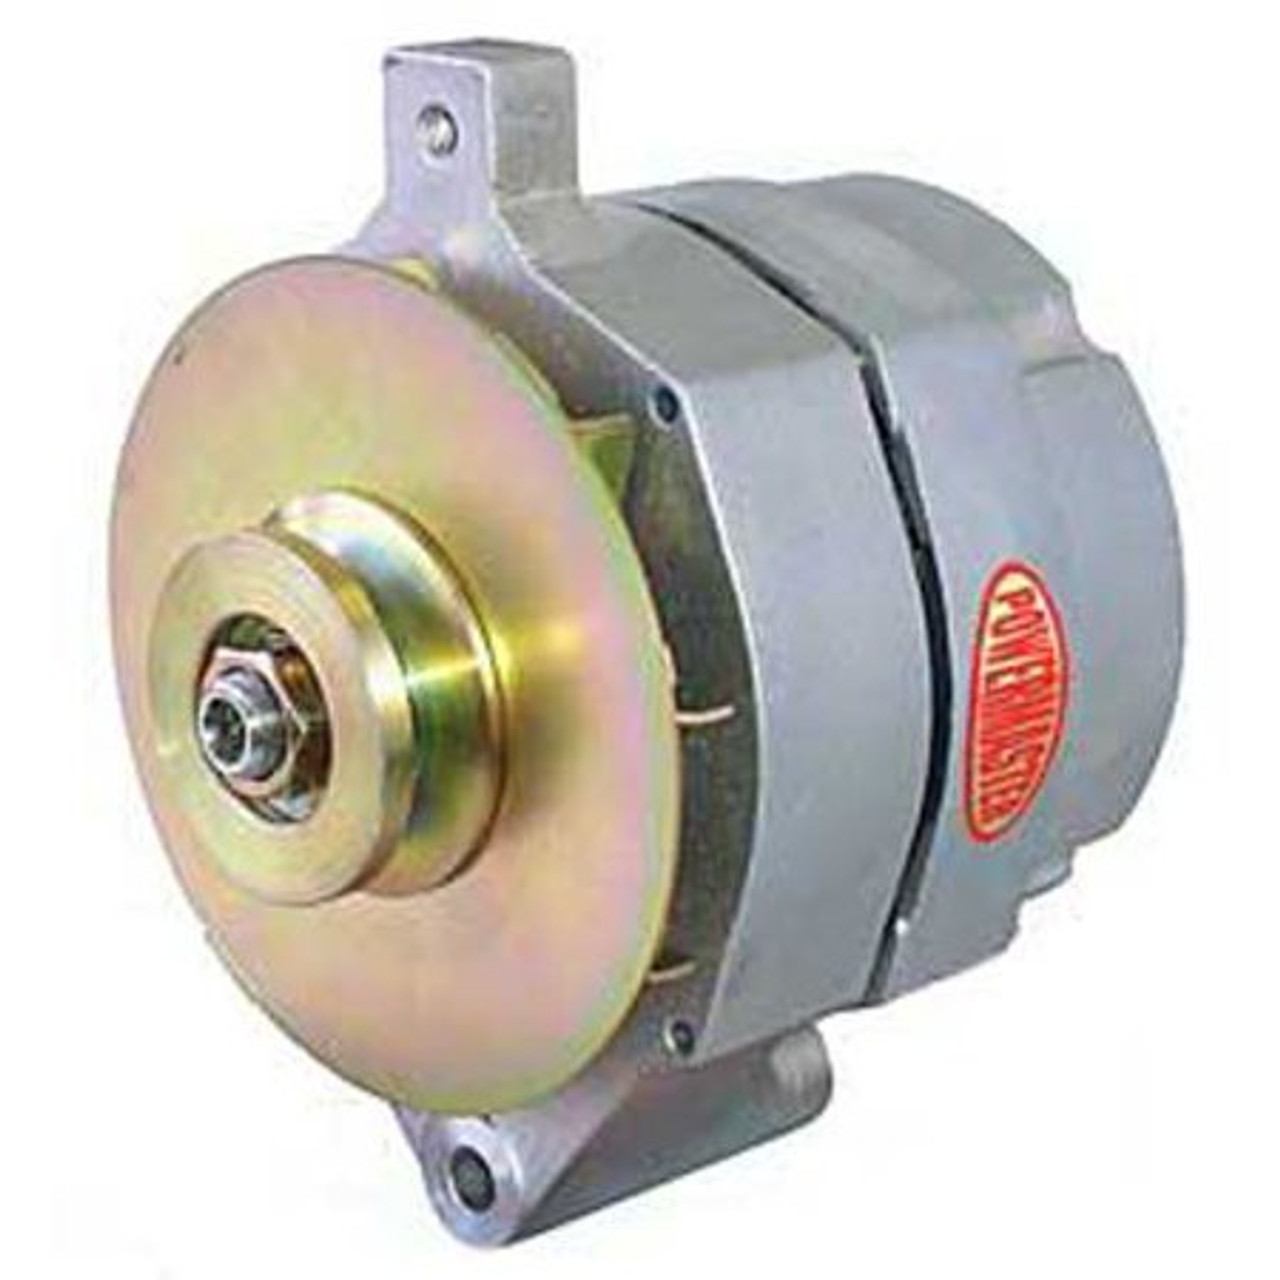 [DIAGRAM_38DE]  Powermaster Ford 1-Wire 150 Amp Upgrade Alternator, Plain - SO-CAL Speed  Shop AZ | Ford Powermaster Alternators Wiring |  | SO-CAL Speed Shop AZ